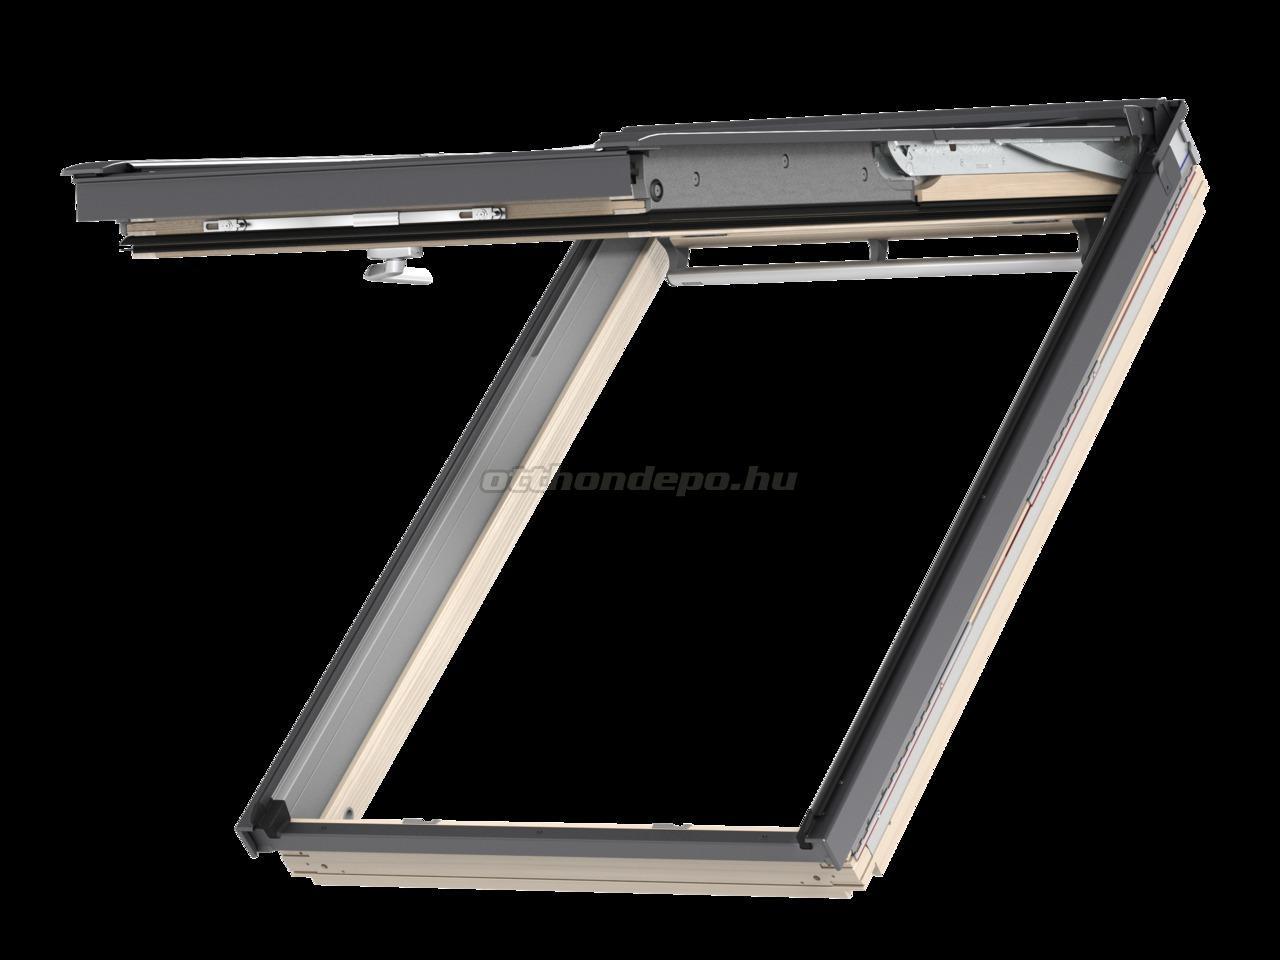 velux panor ma ablak gpl 3073 pk06 94x118 cm otthon depo web ruh z. Black Bedroom Furniture Sets. Home Design Ideas